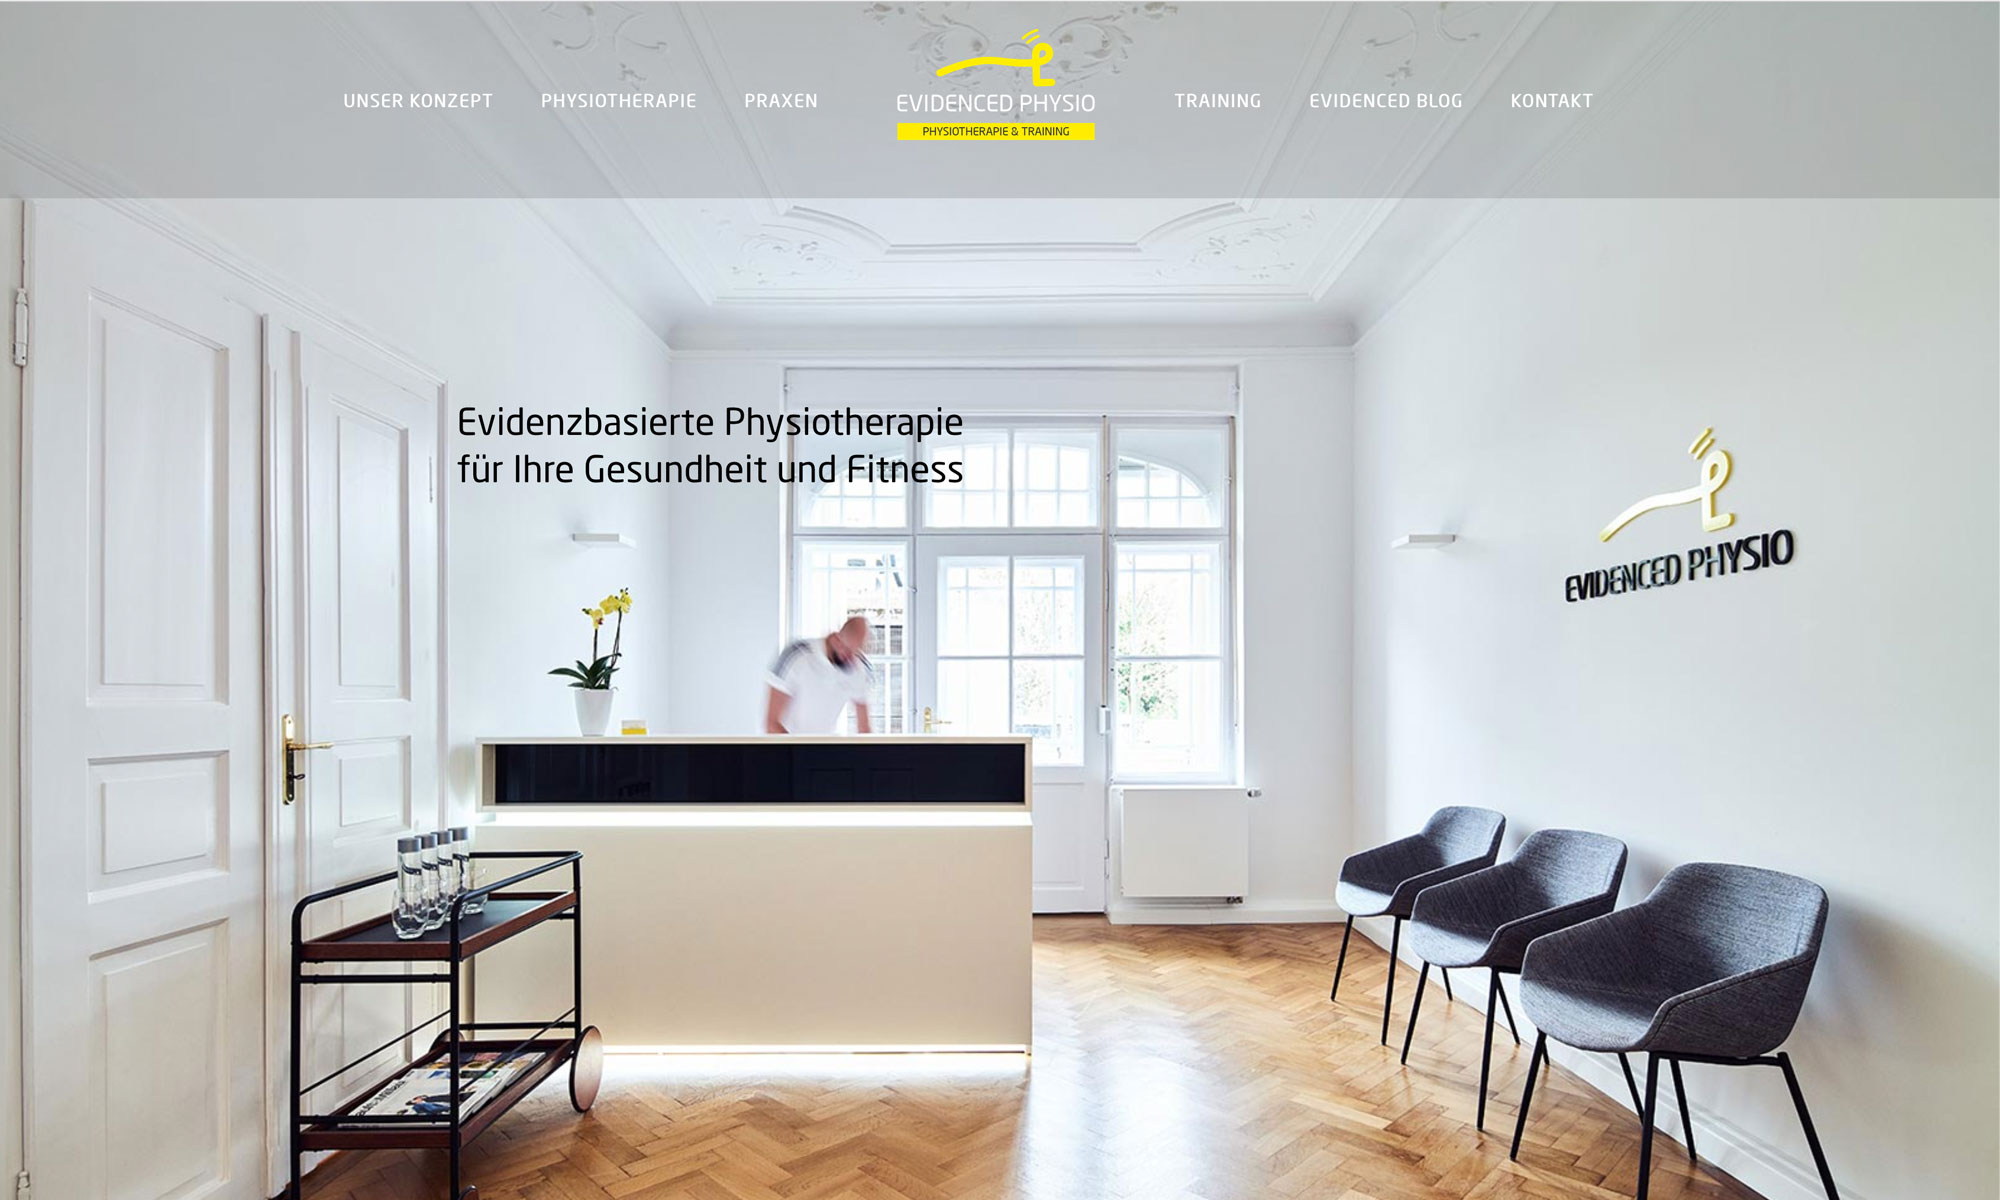 webdesign Physiotherapie